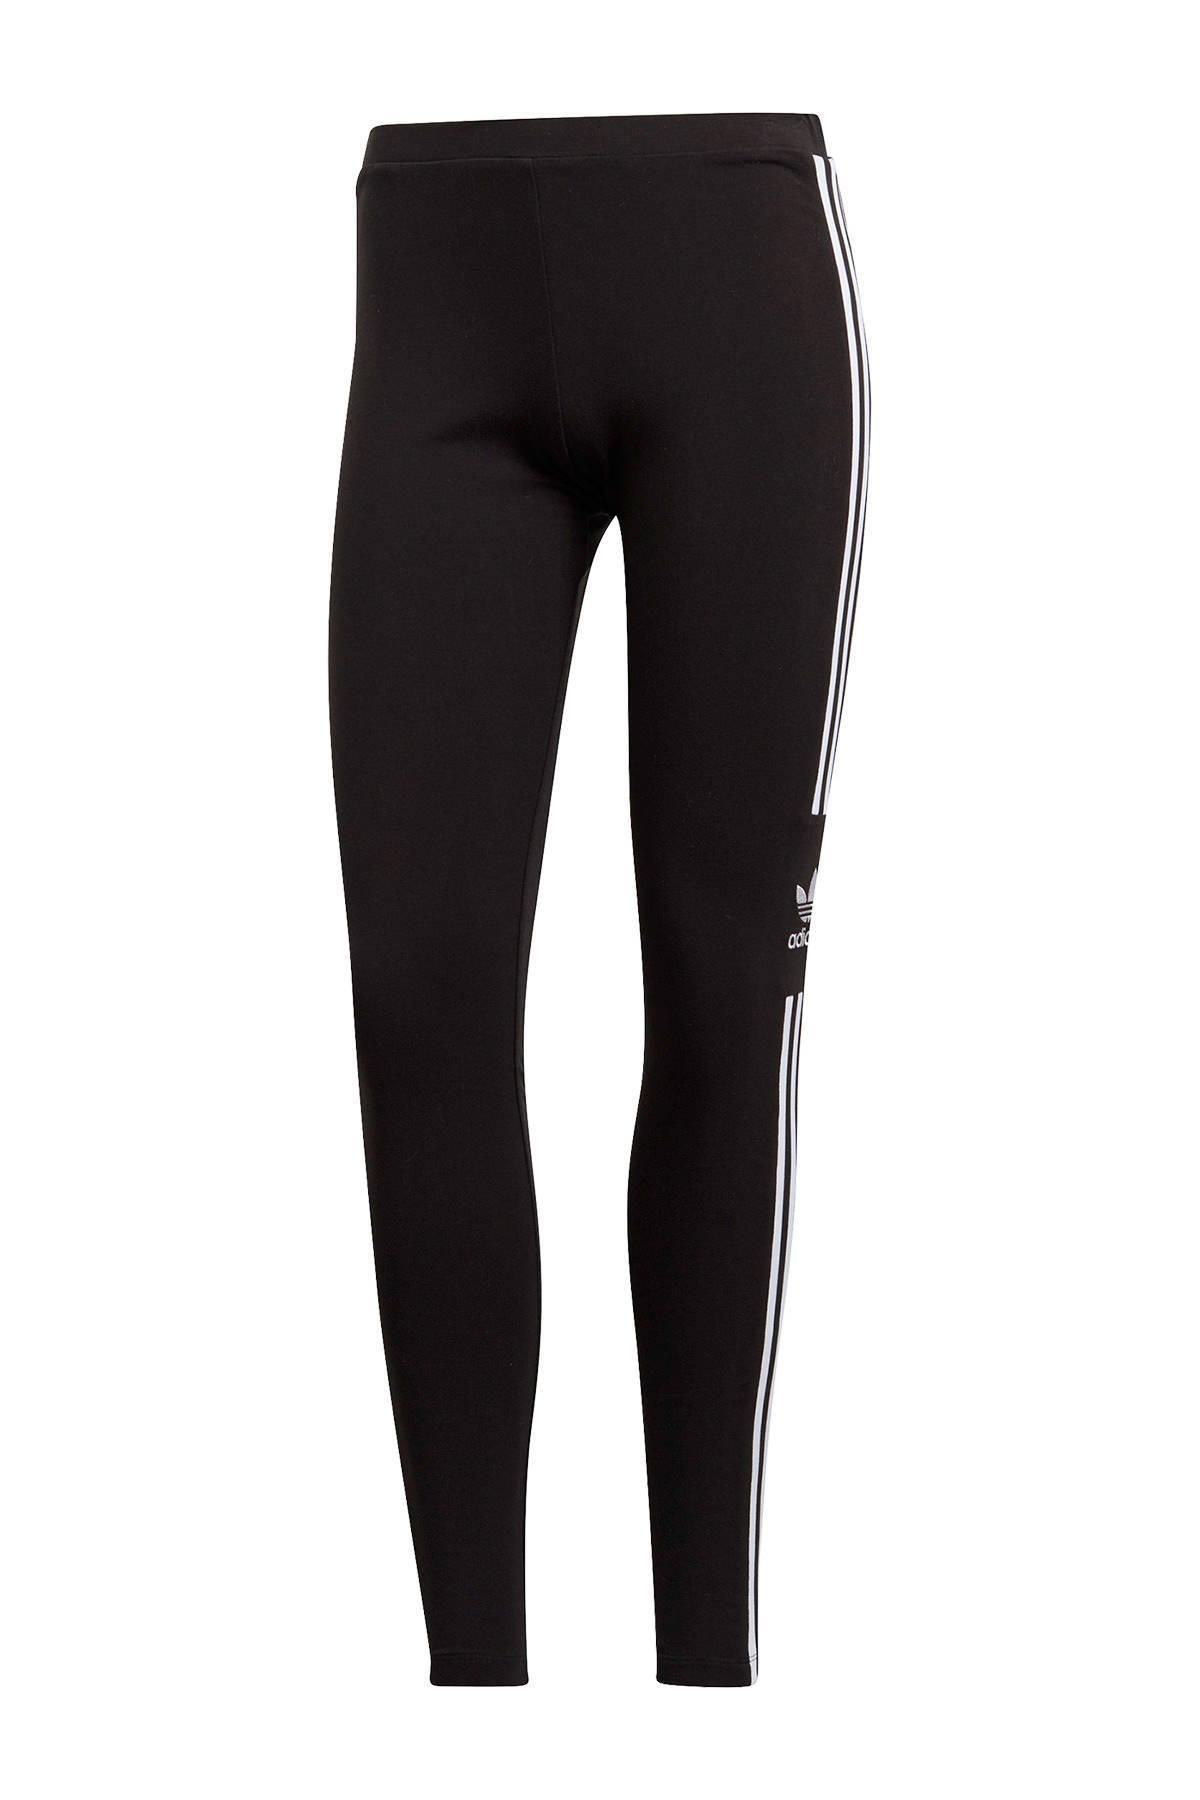 Adicolor 7/8 legging zwart